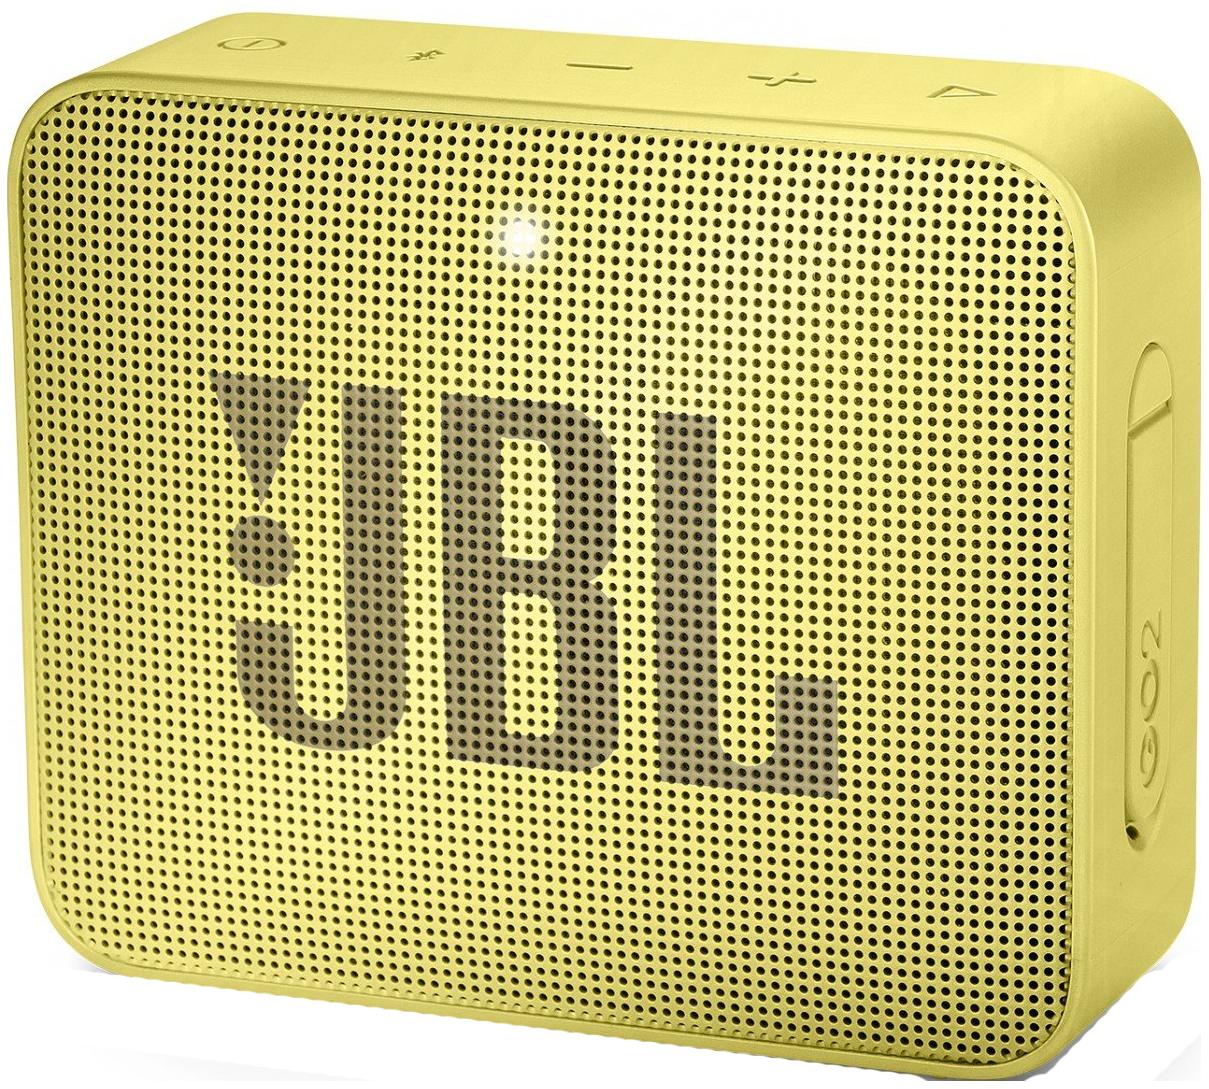 Беспроводная акустика JBL Go 2 JBLGO2YEL